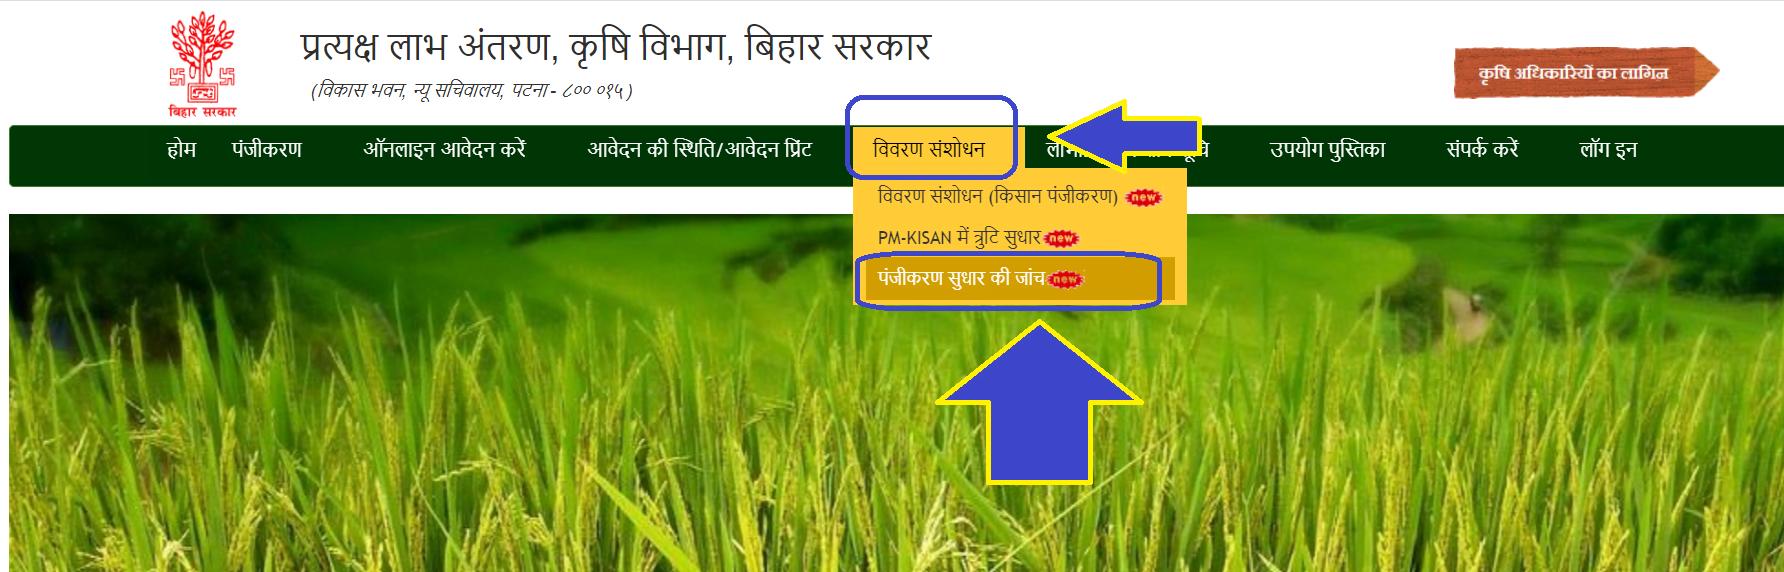 vivran-sanshodhan-jaljeevan-hariyali-scheme